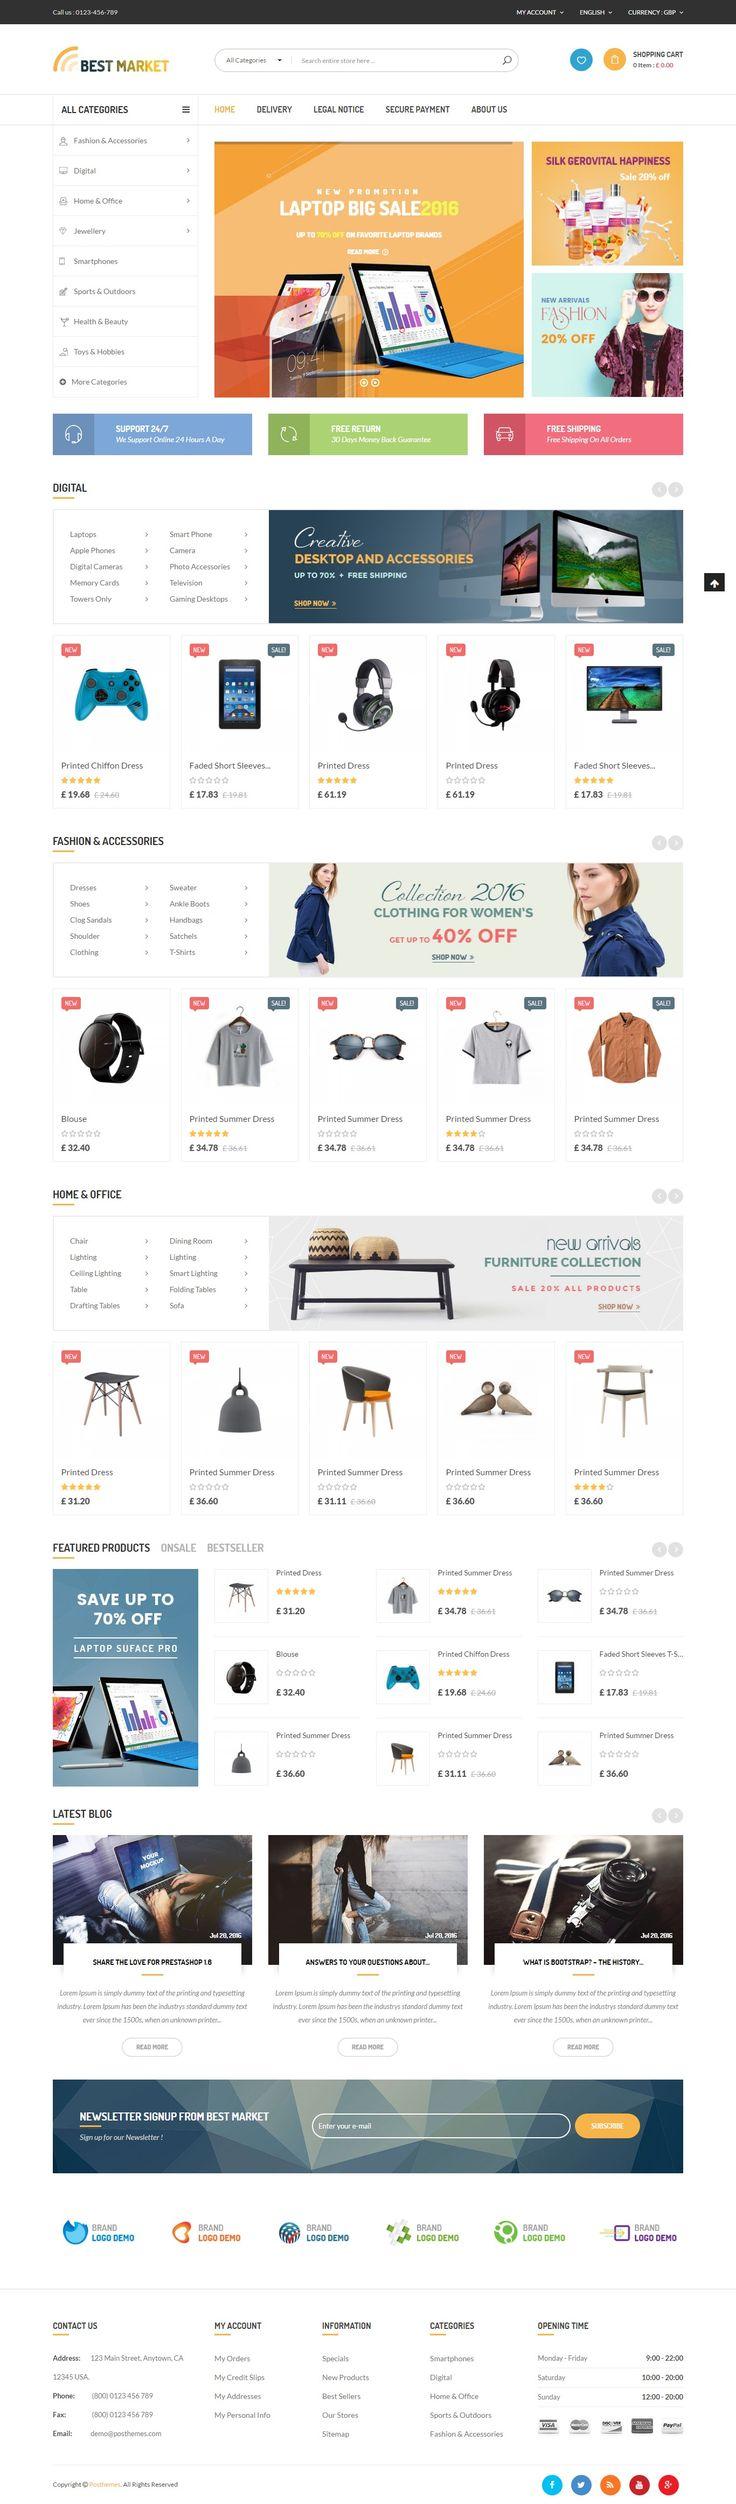 [YesThemes.net] - Free download BestMarket - Multipurpose Mega Shop Responsive Prestashop Theme